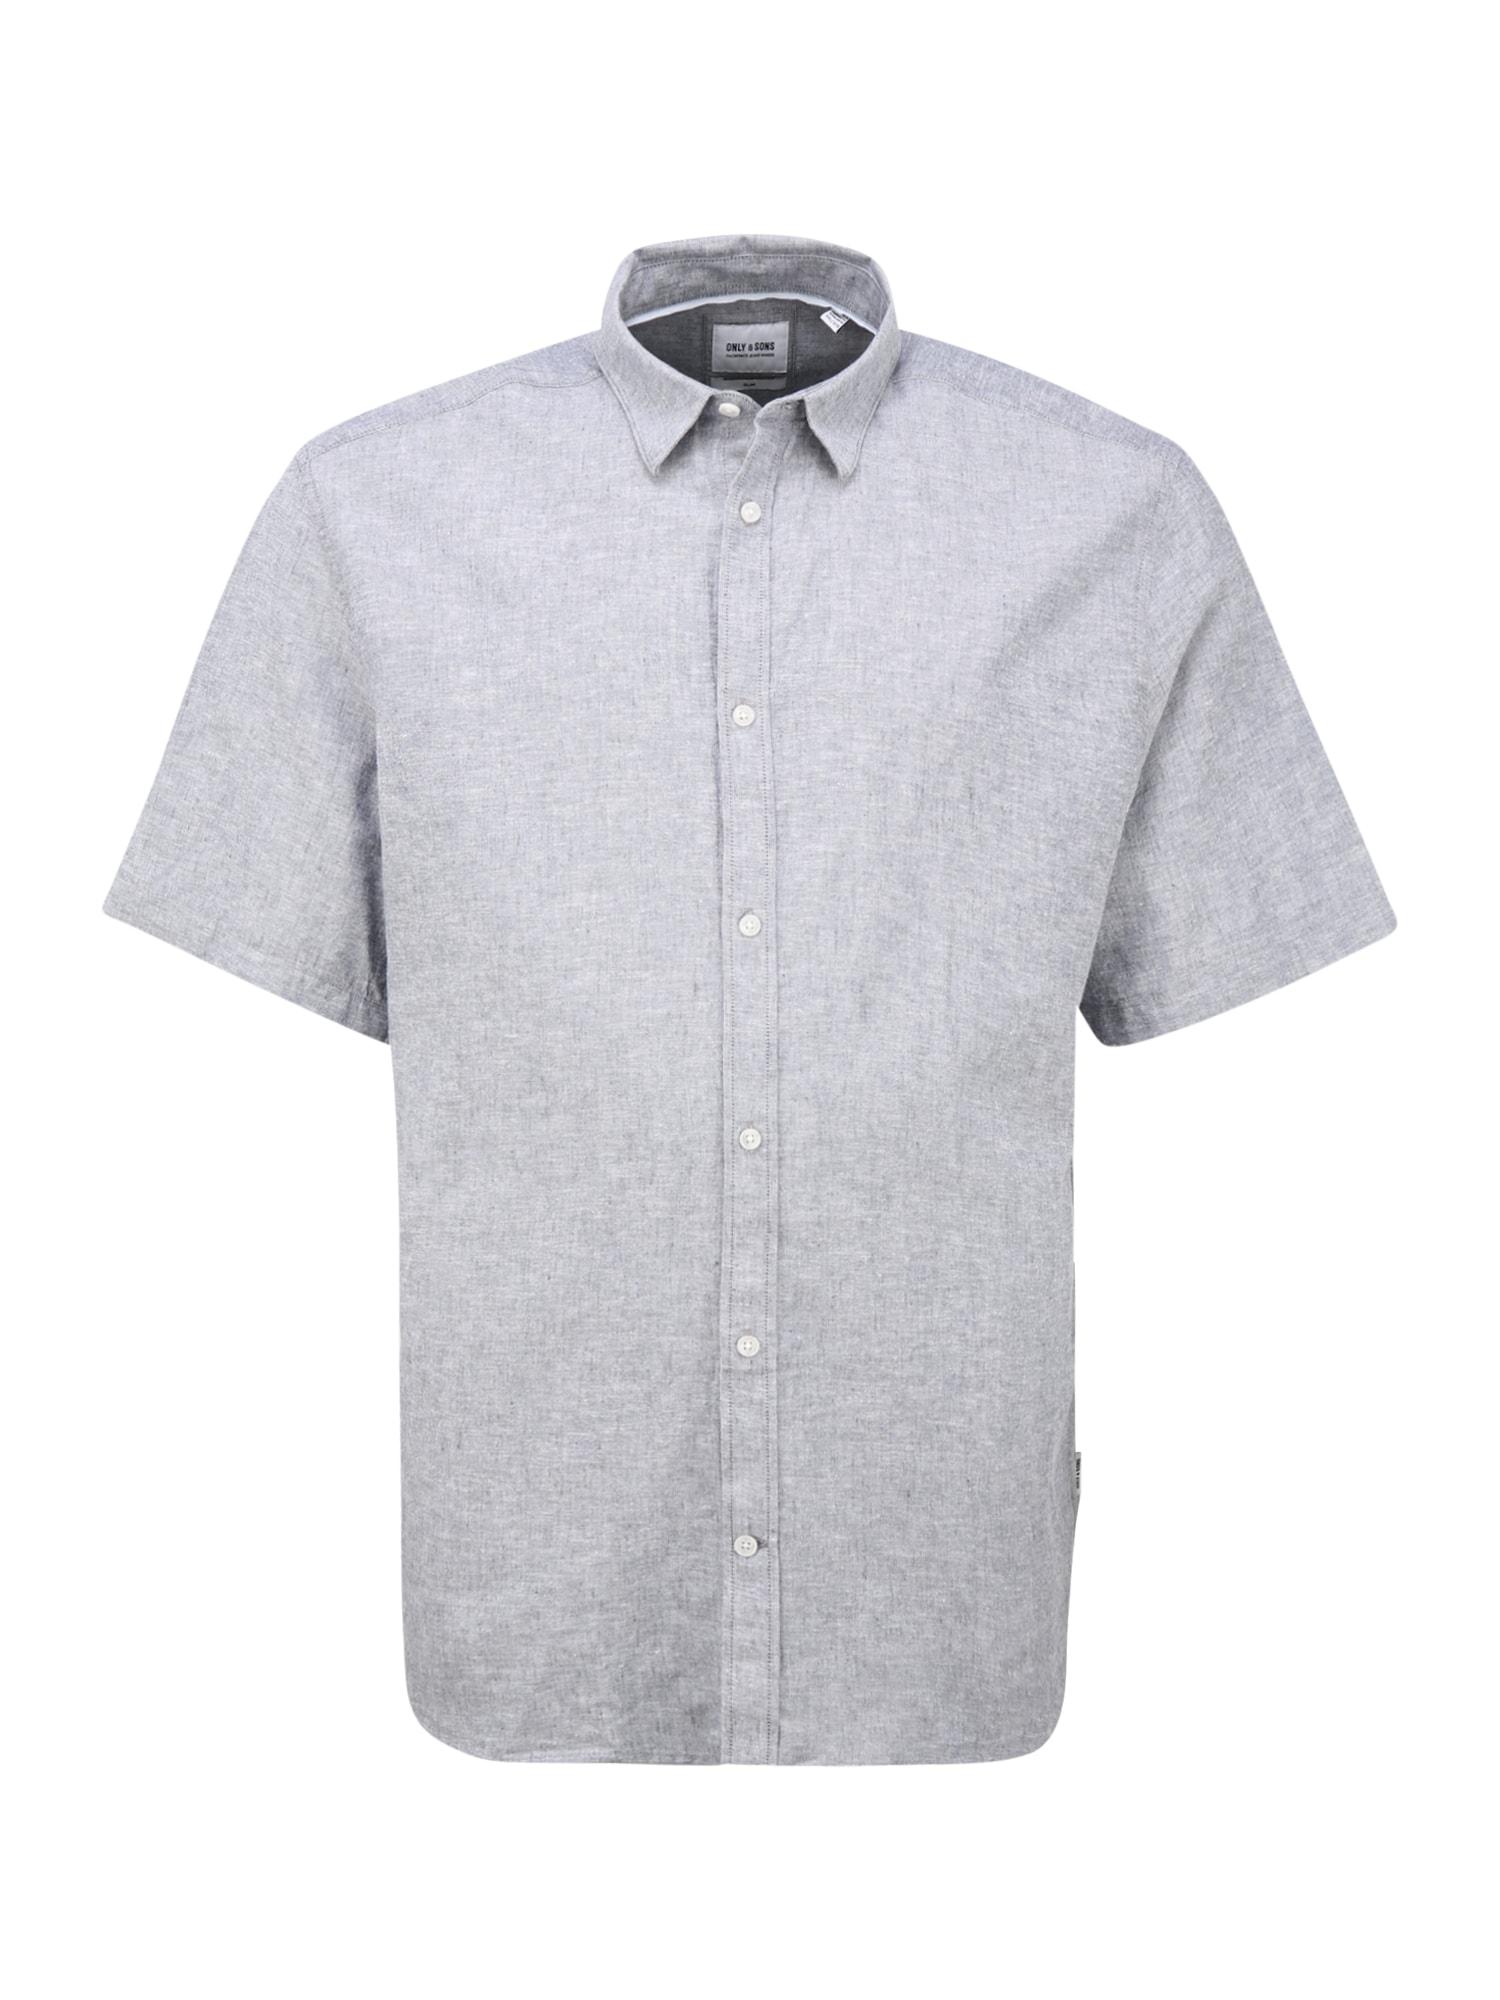 Only & Sons (Big & Tall) Marškiniai